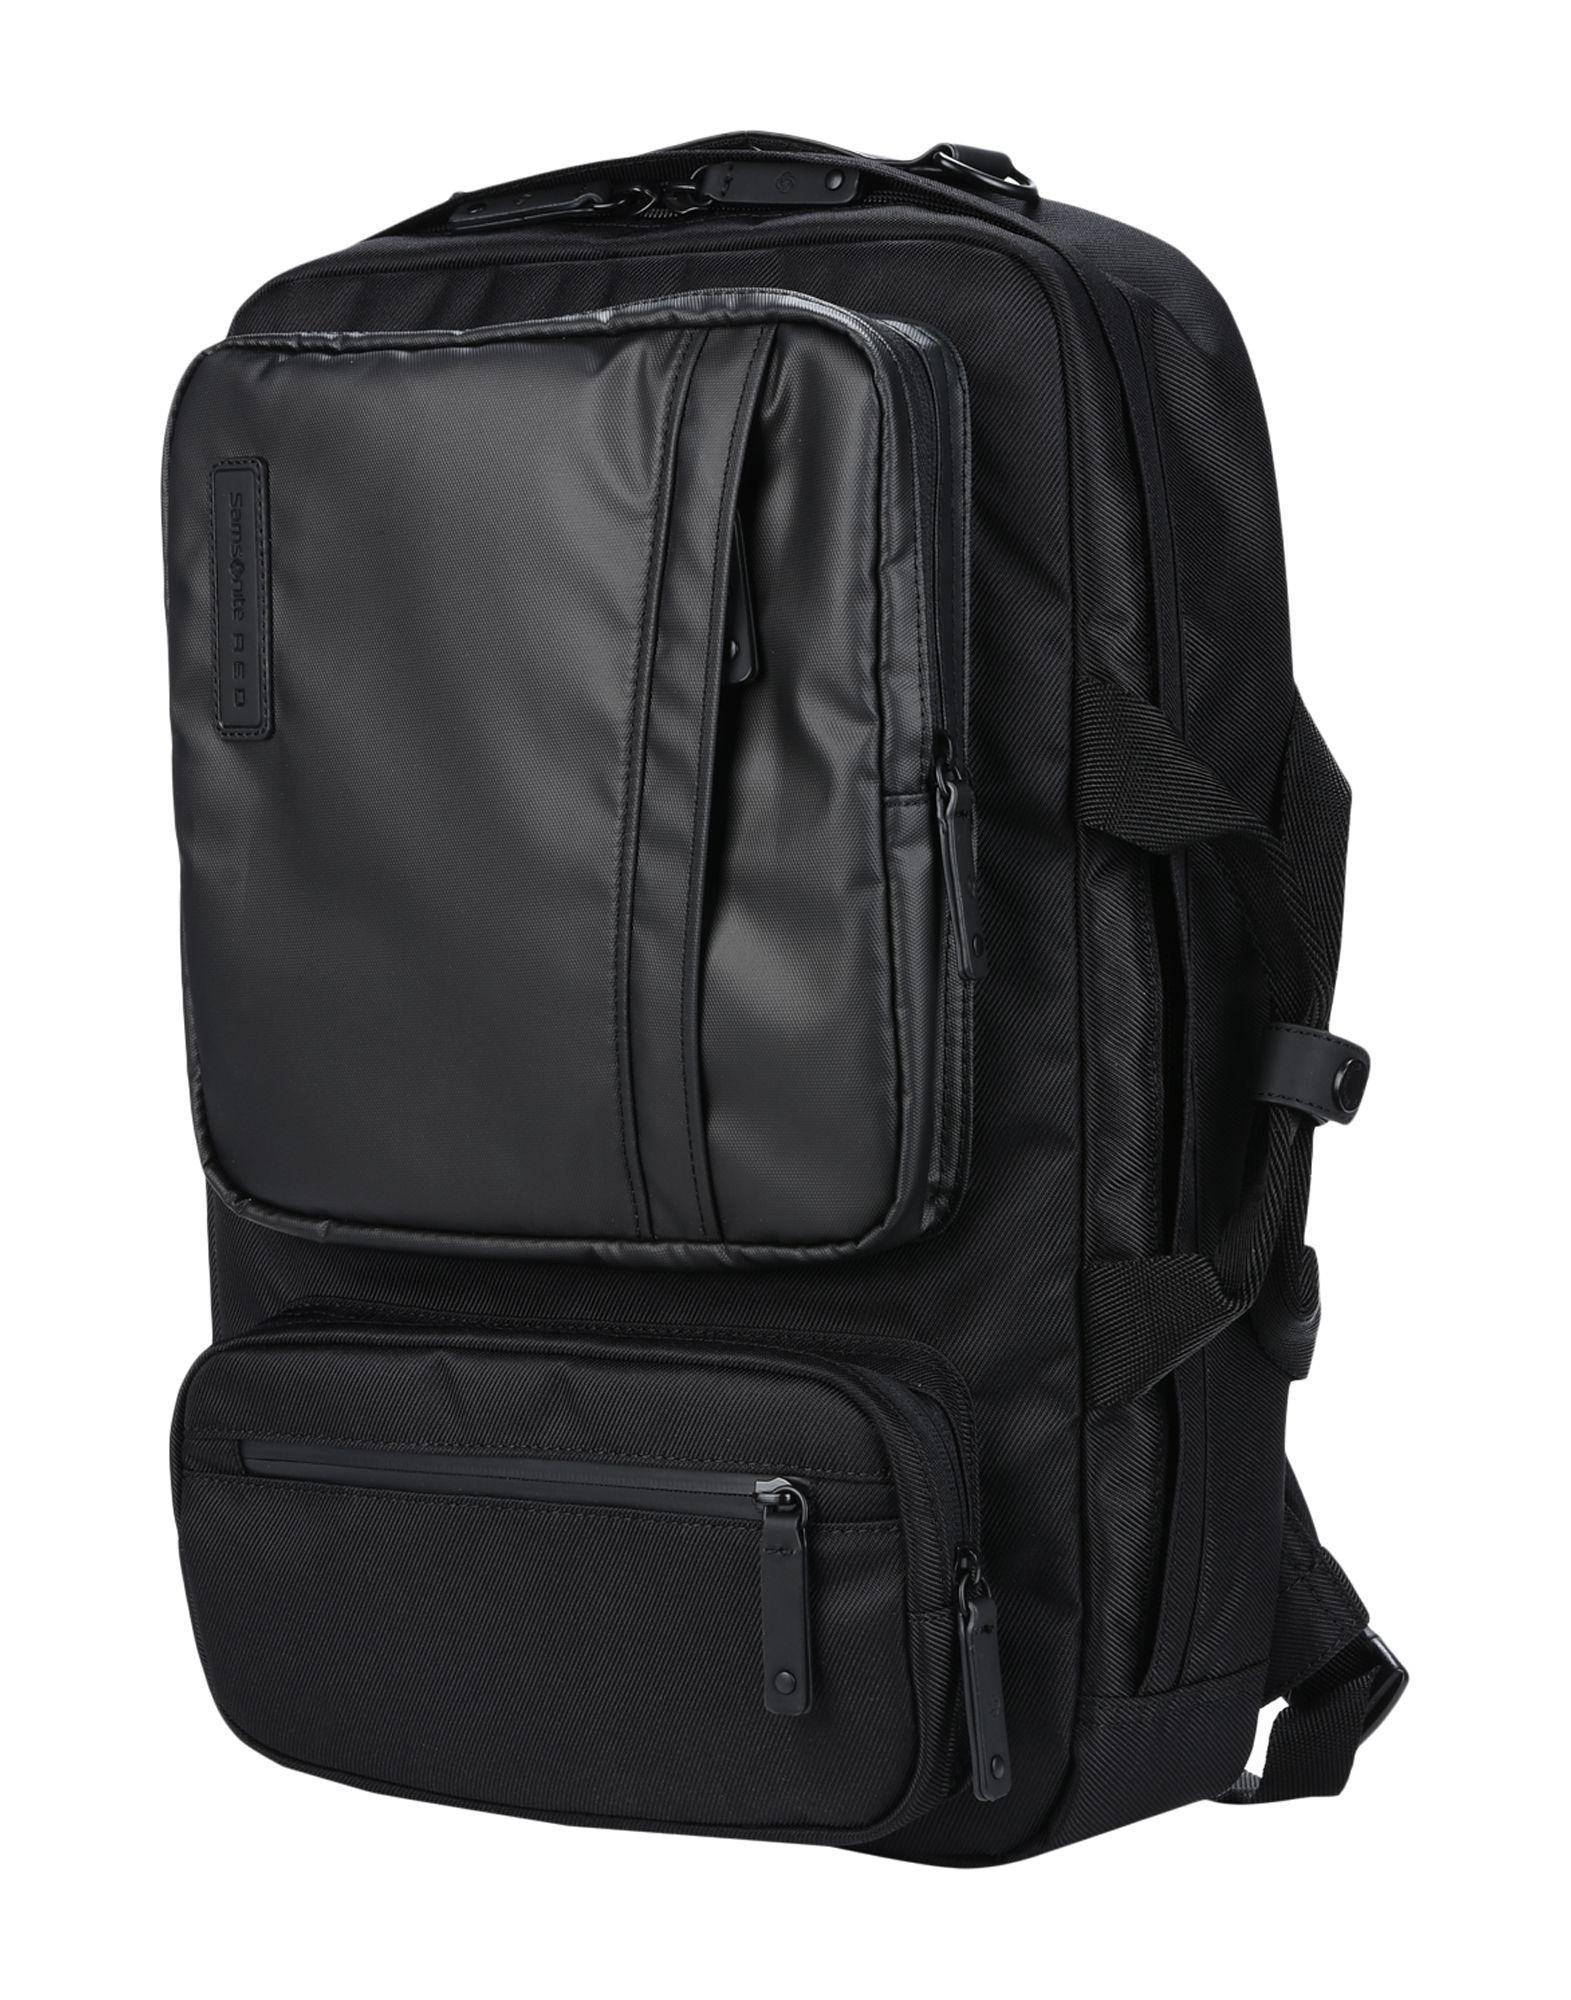 SAMSONITE RED Рюкзаки и сумки на пояс дорожные сумки samsonite 46n 003 черный